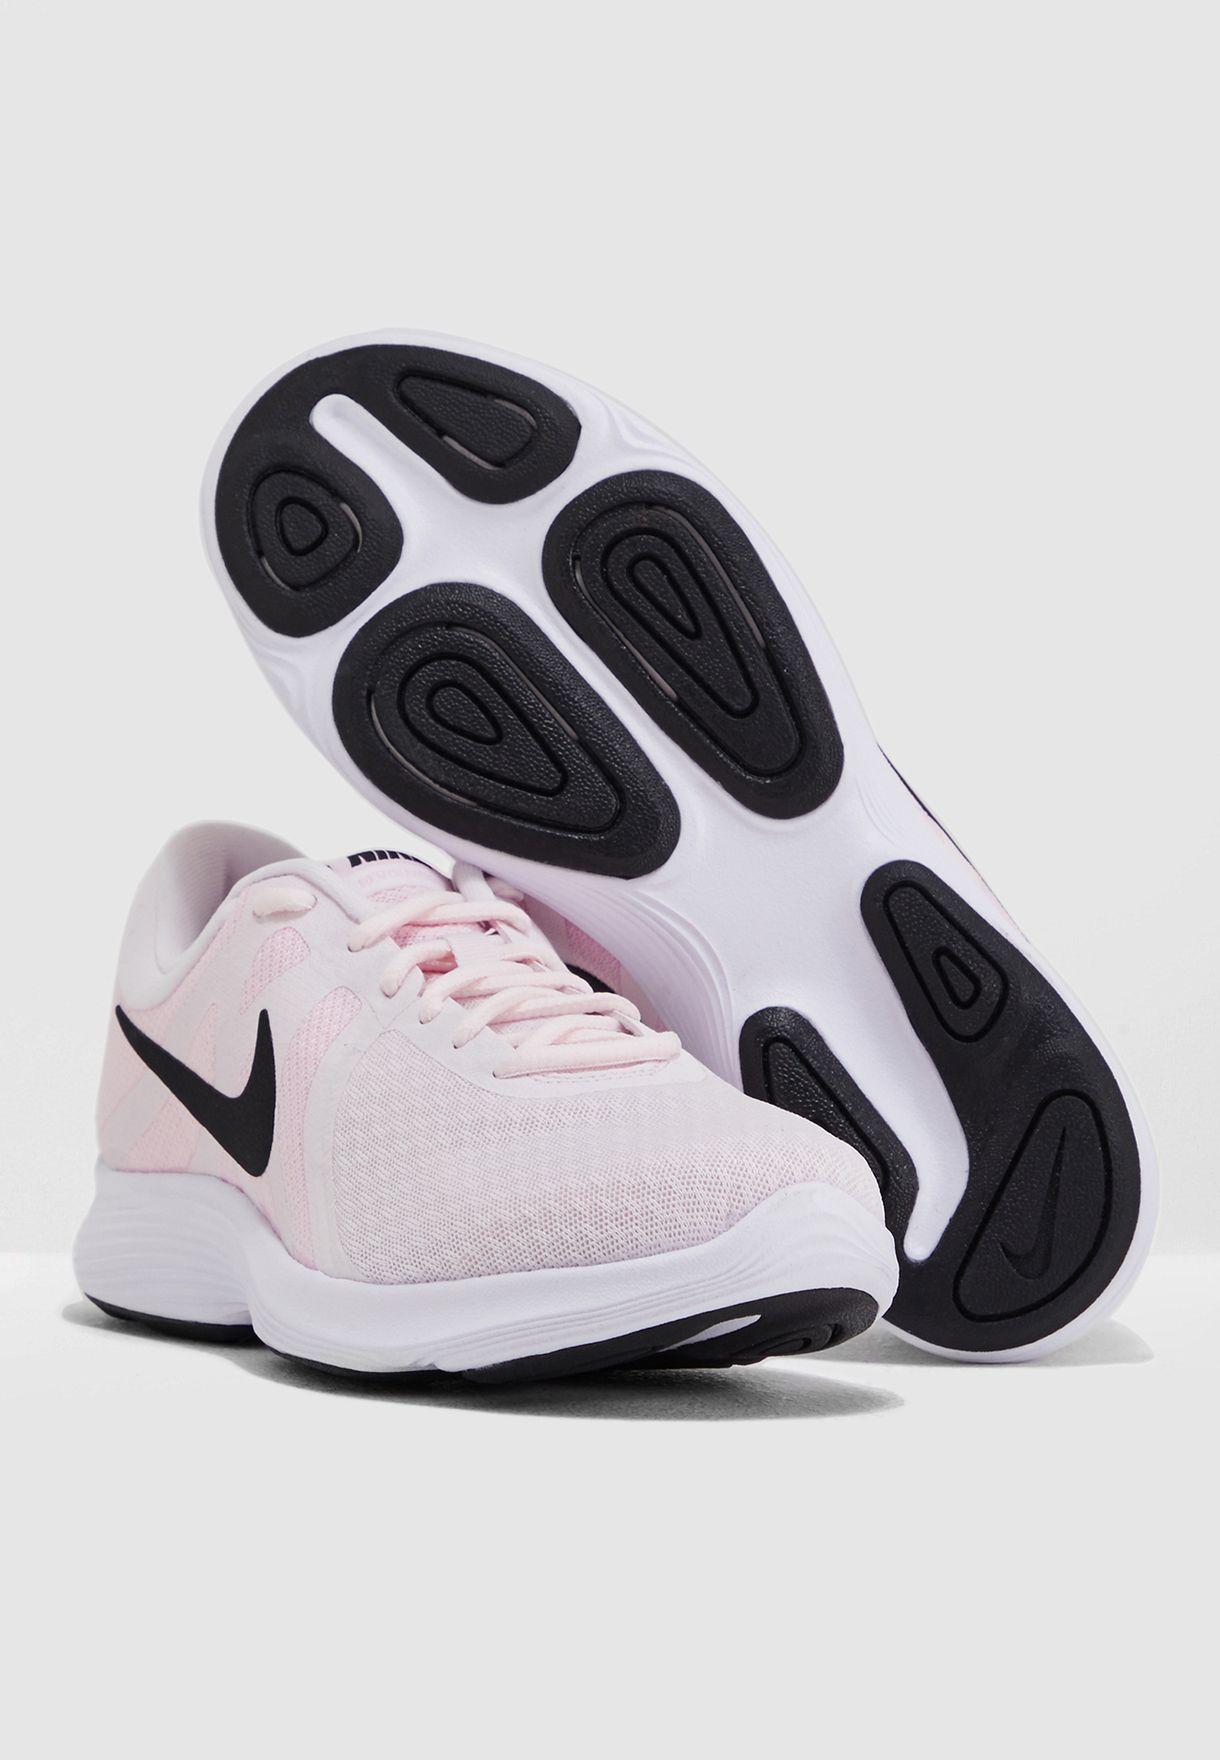 fb2922684 تسوق حذاء ريفولوشن 4 ماركة نايك لون وردي AJ3491-604 في السعودية ...